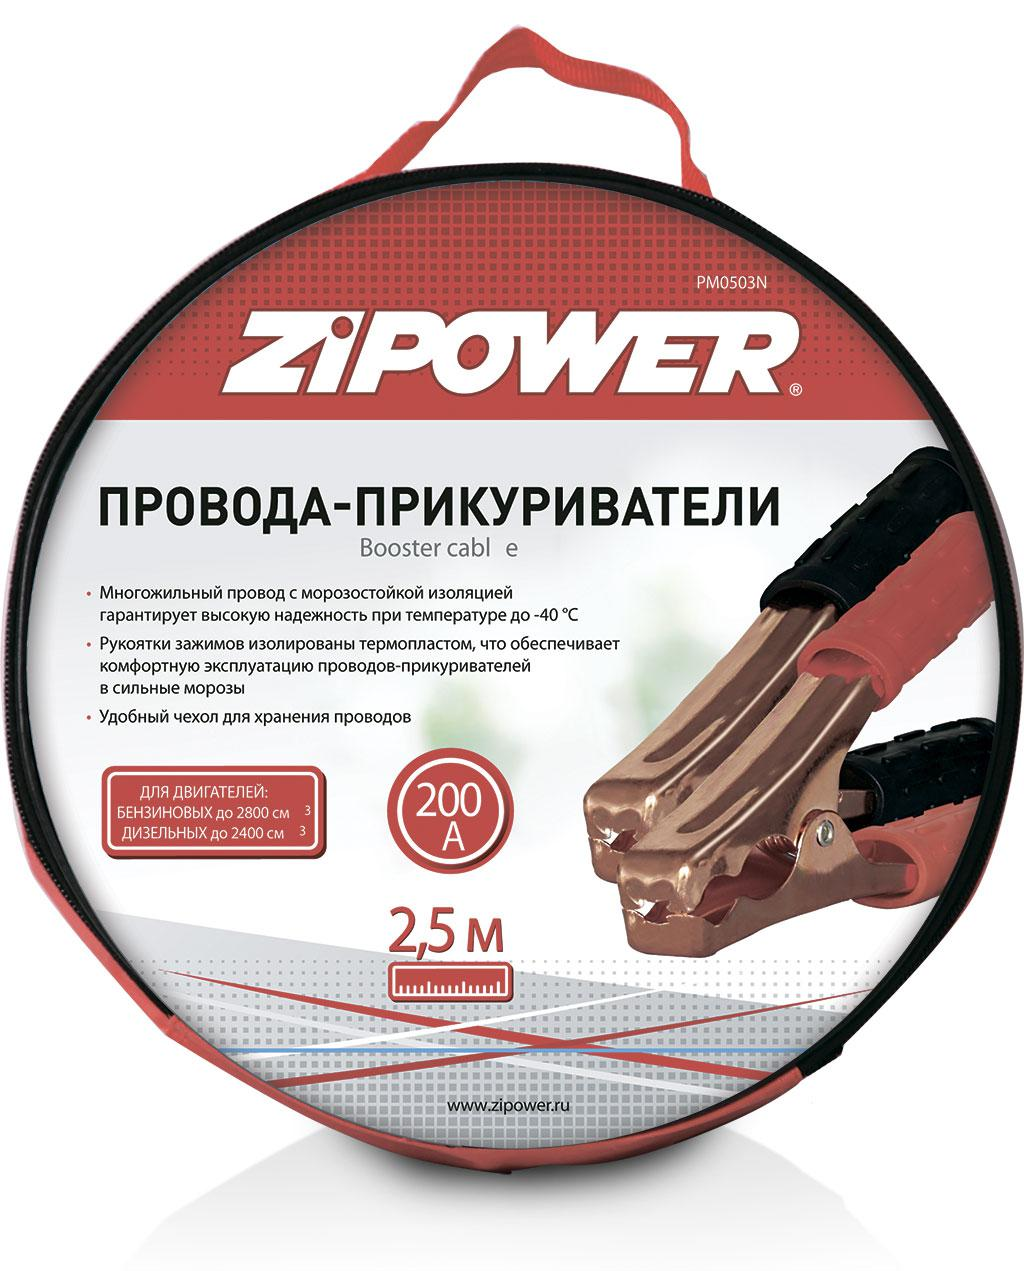 Провода прикуривания Zipower Pm0503n цена